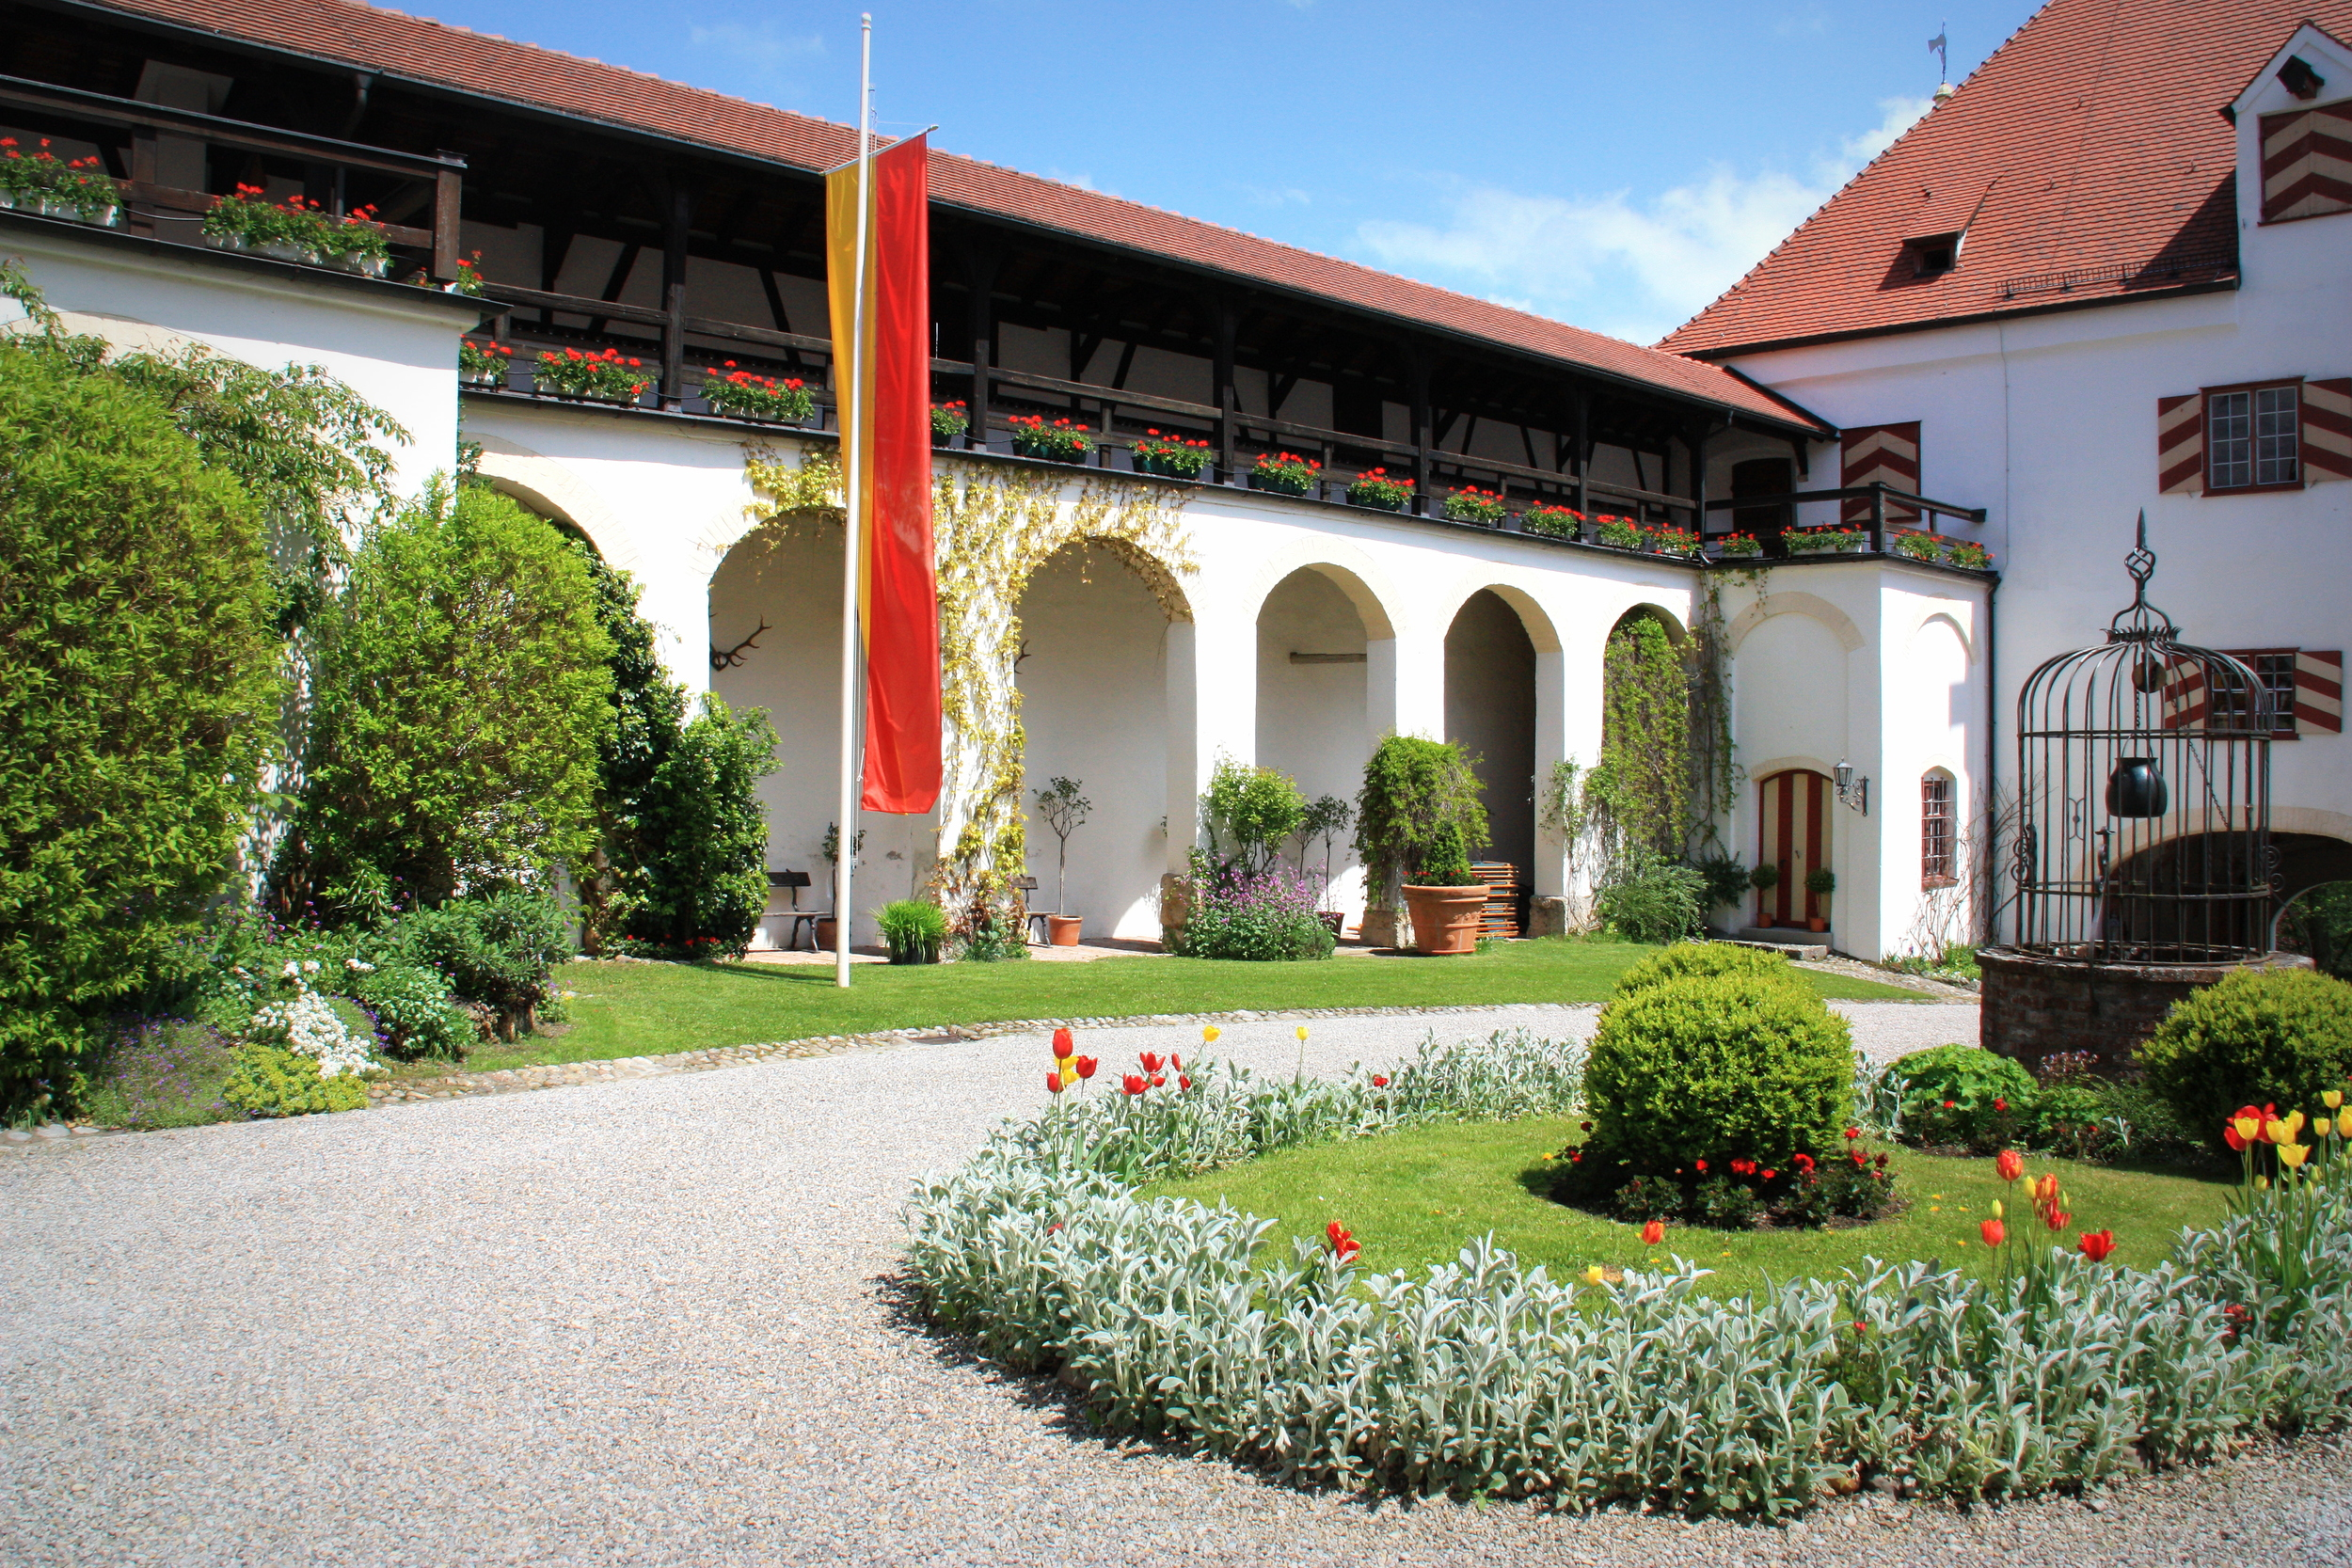 Schlosshof_SchlossKronburg.JPG